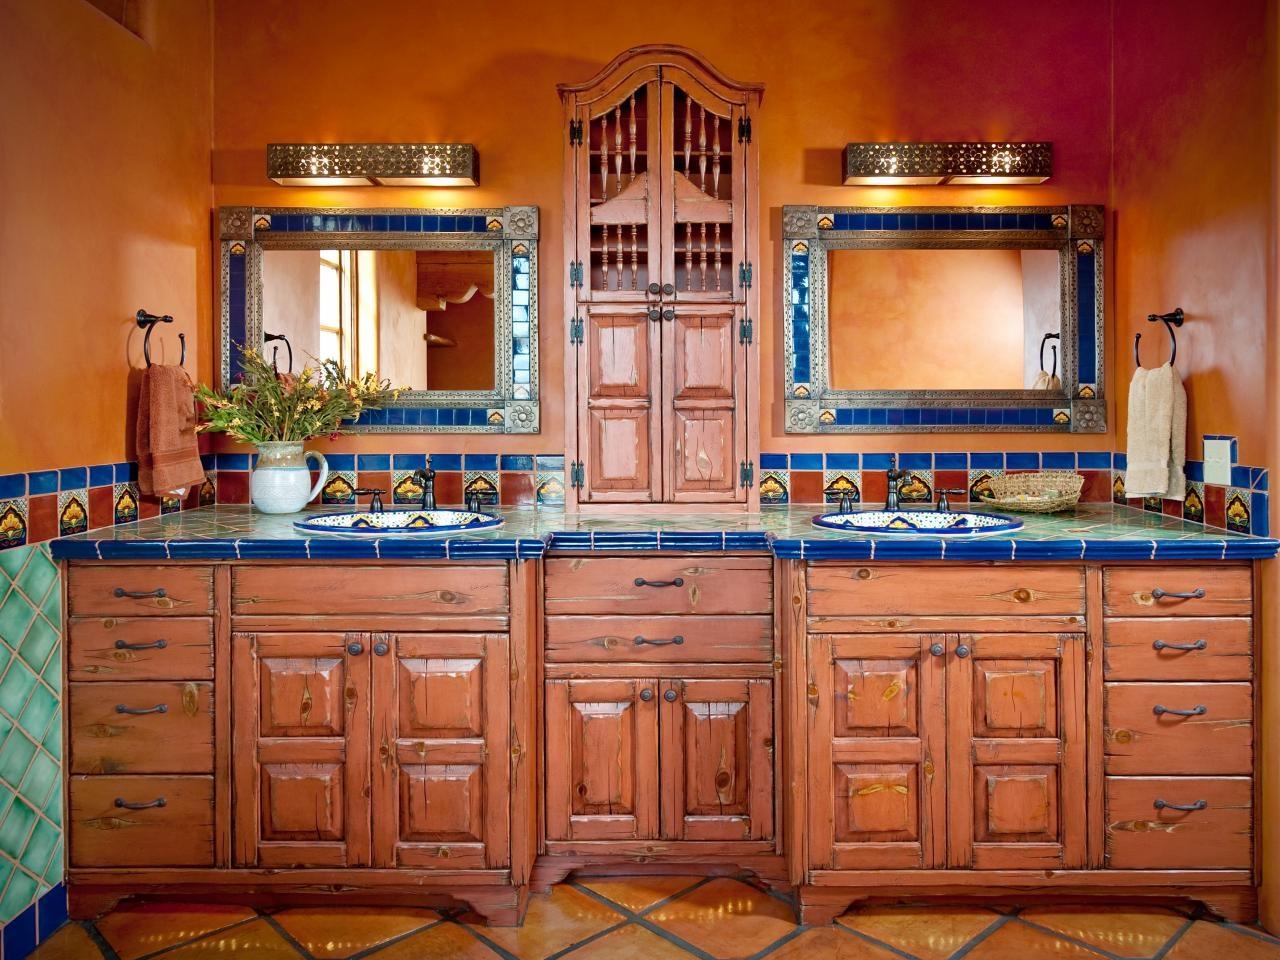 Mexican/Southwest theme bath decor